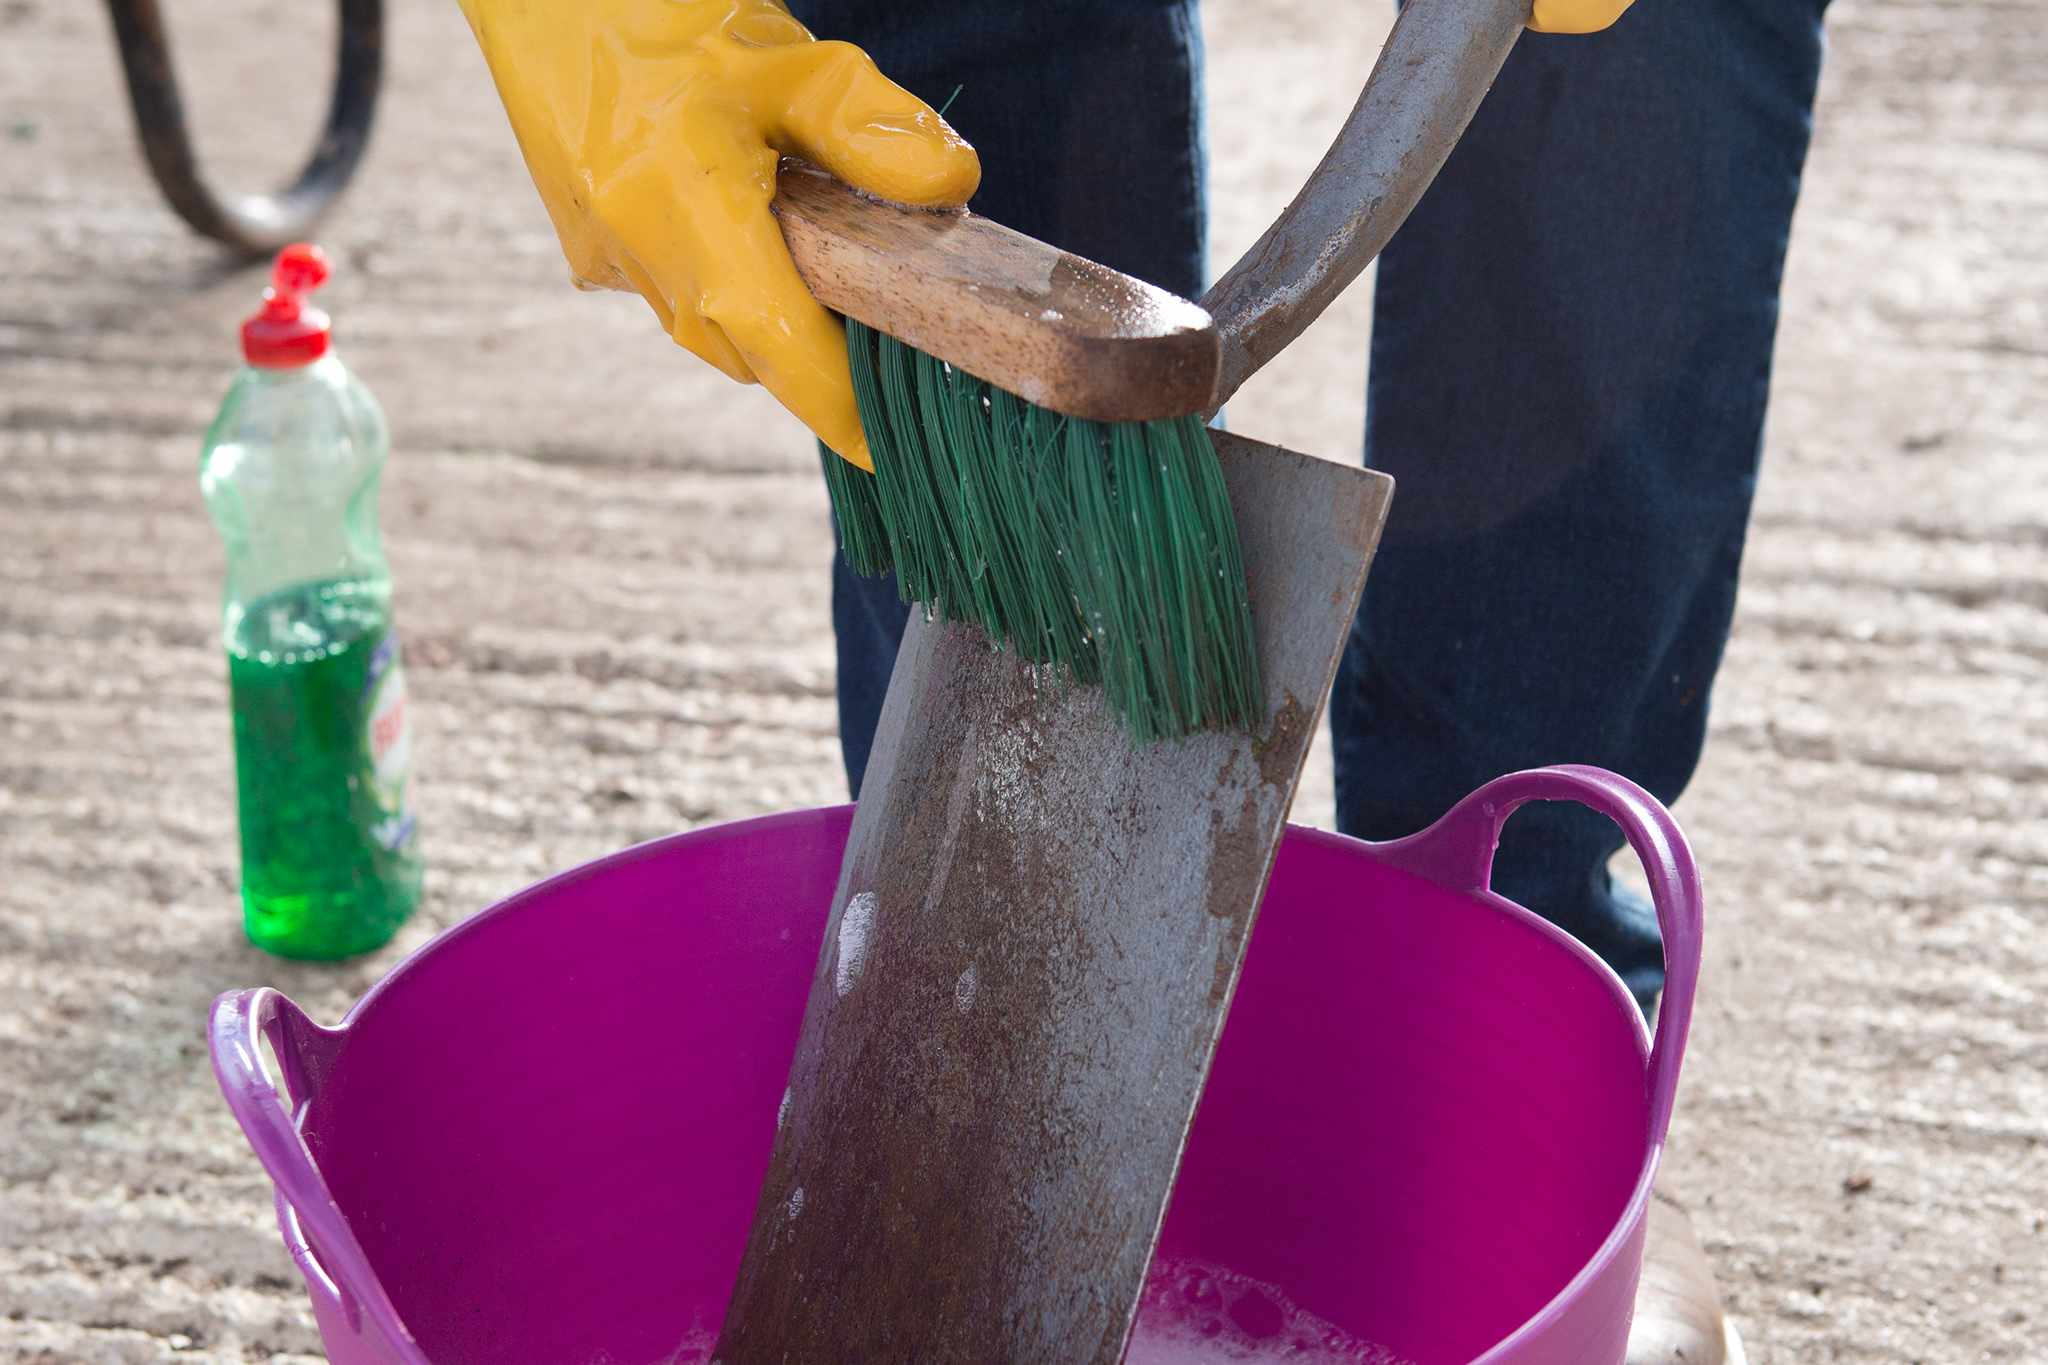 Maintaining a spade